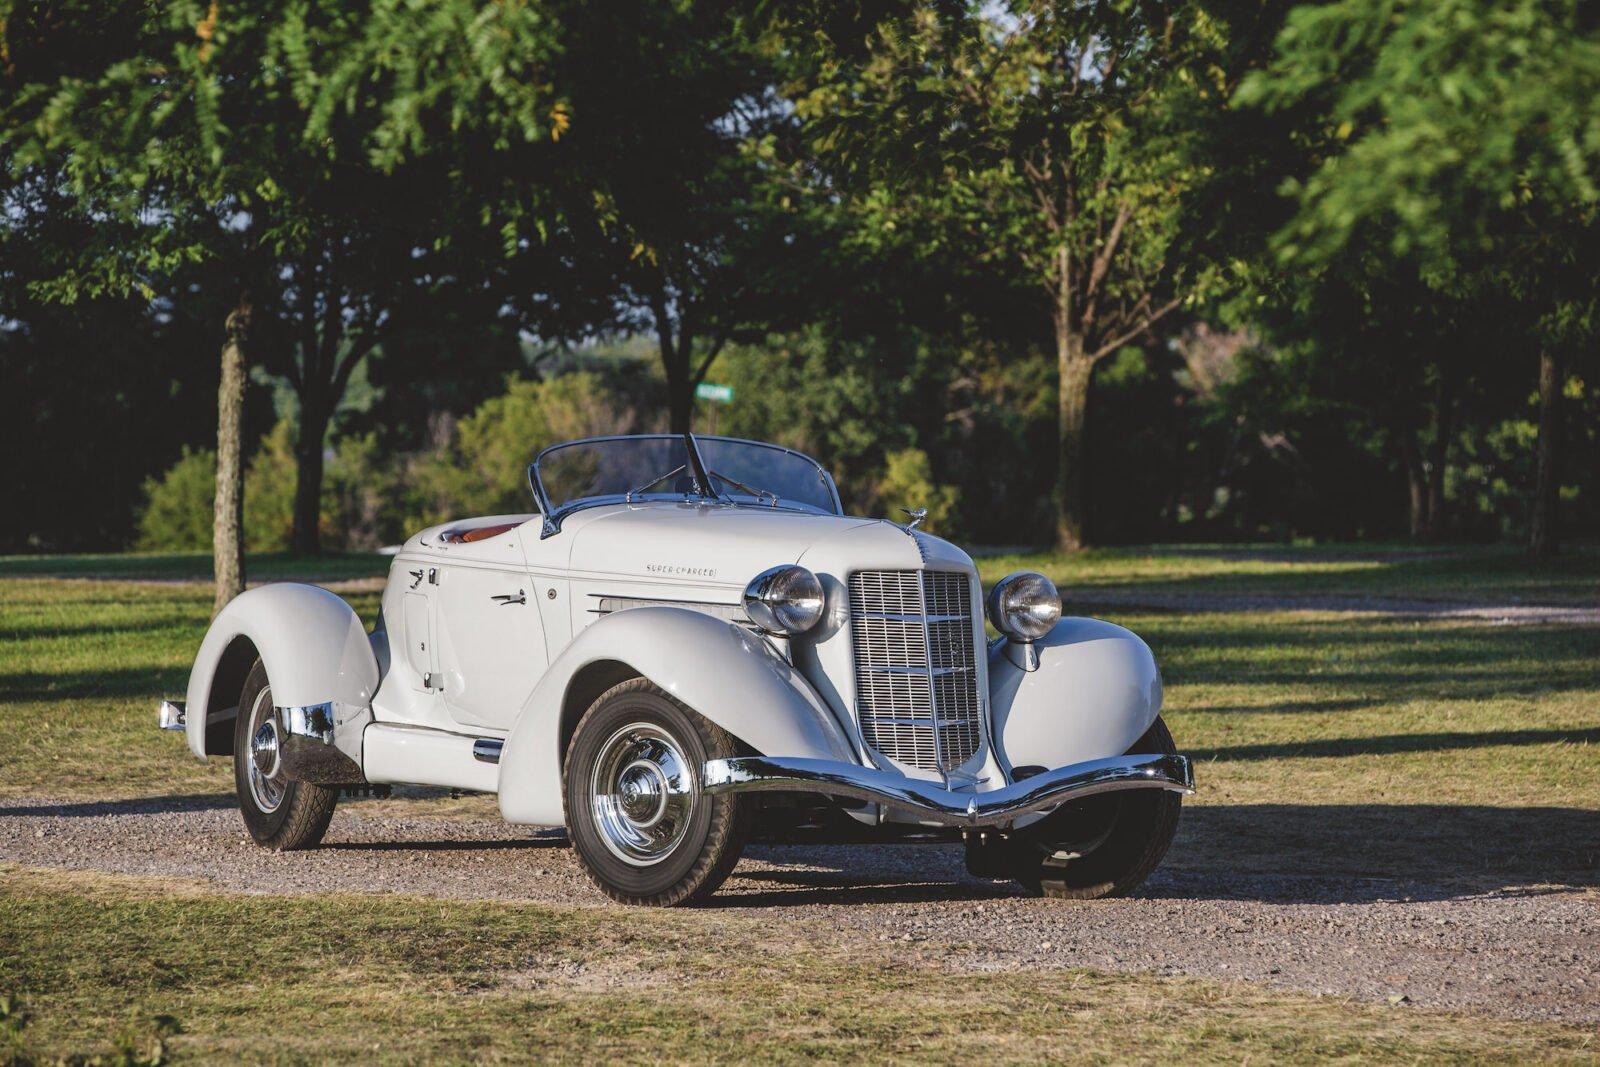 Auburn Eight Supercharged Speedster 1600x1067 - 1935 Auburn Eight Supercharged Speedster